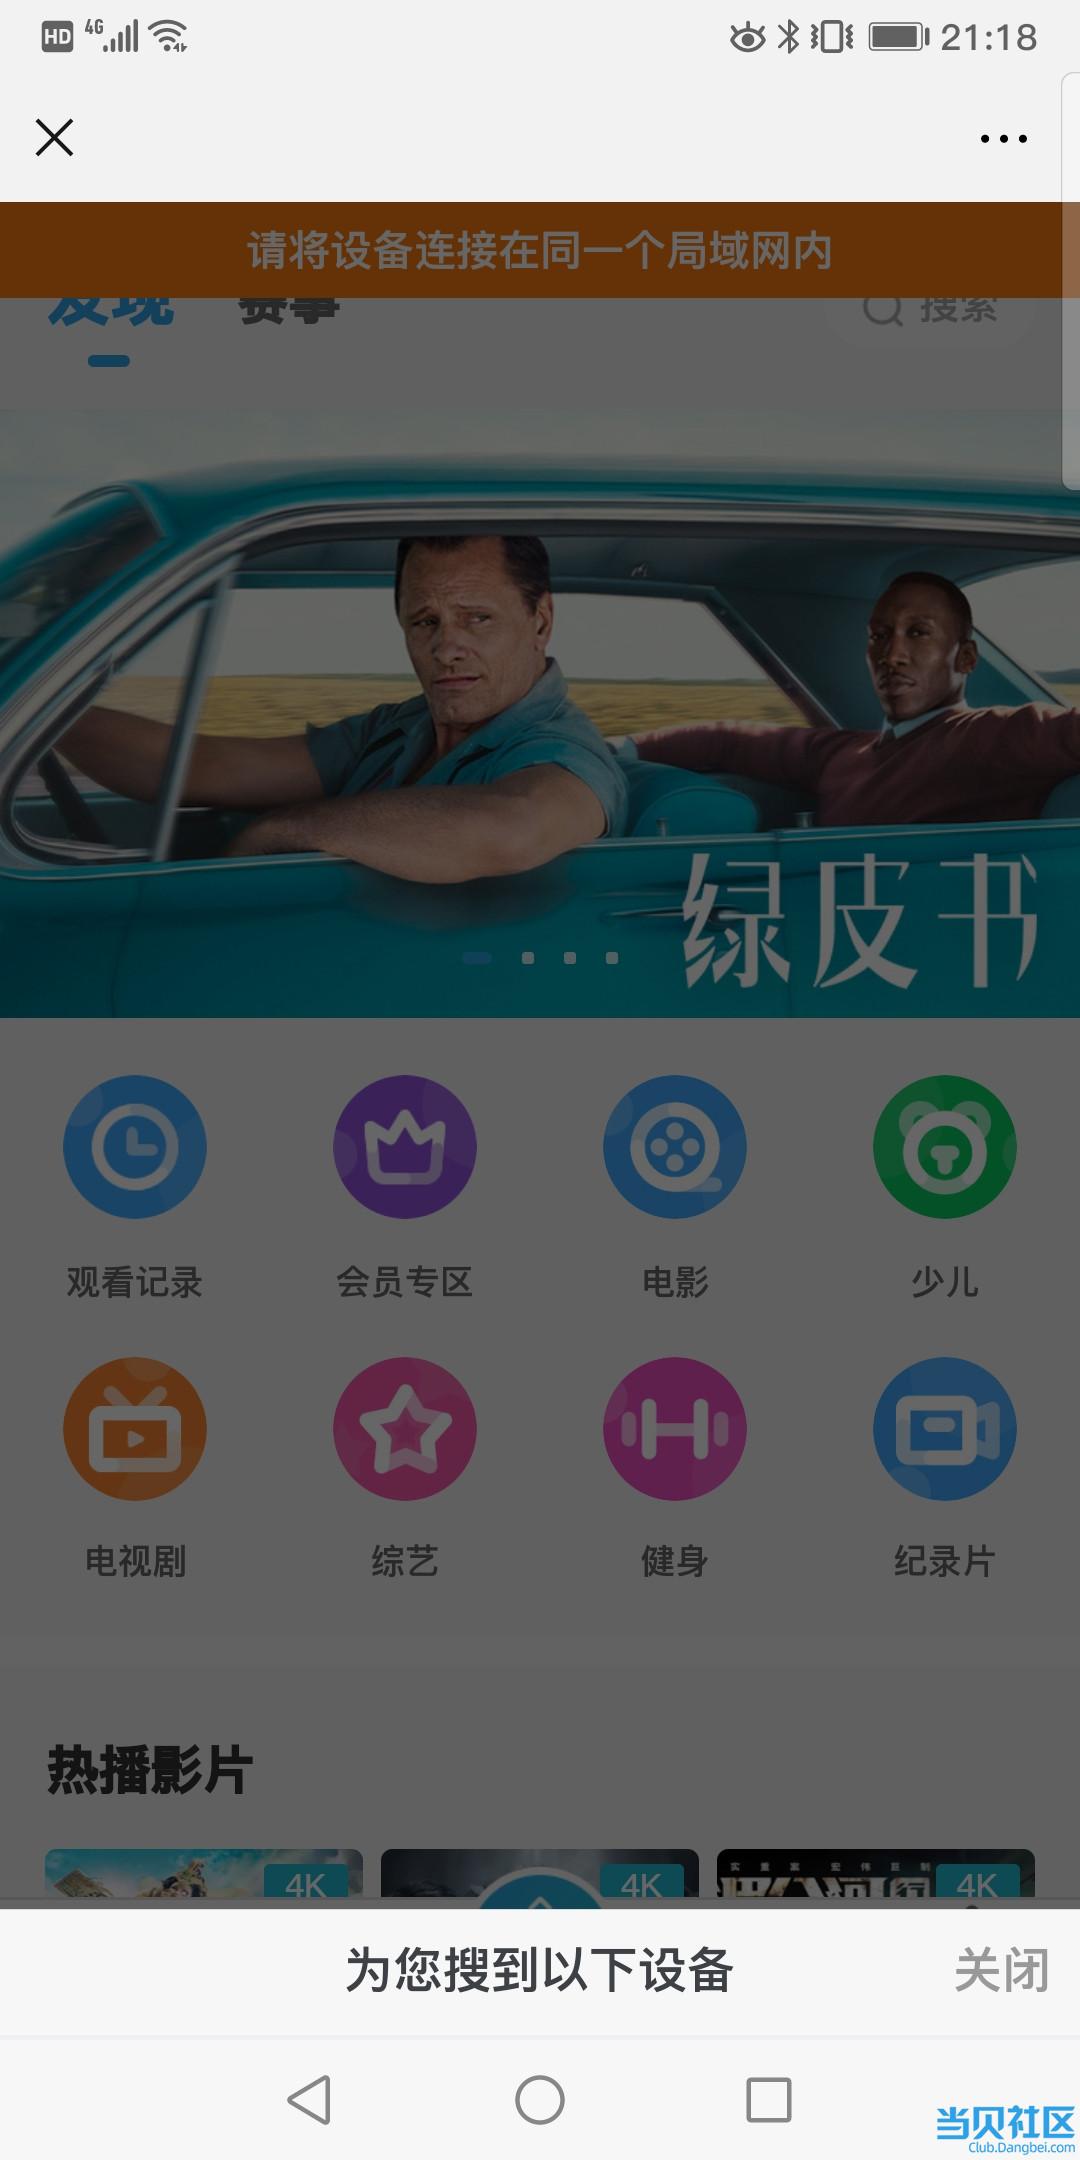 Screenshot_20191014_211833_com.tencent.mm.jpg